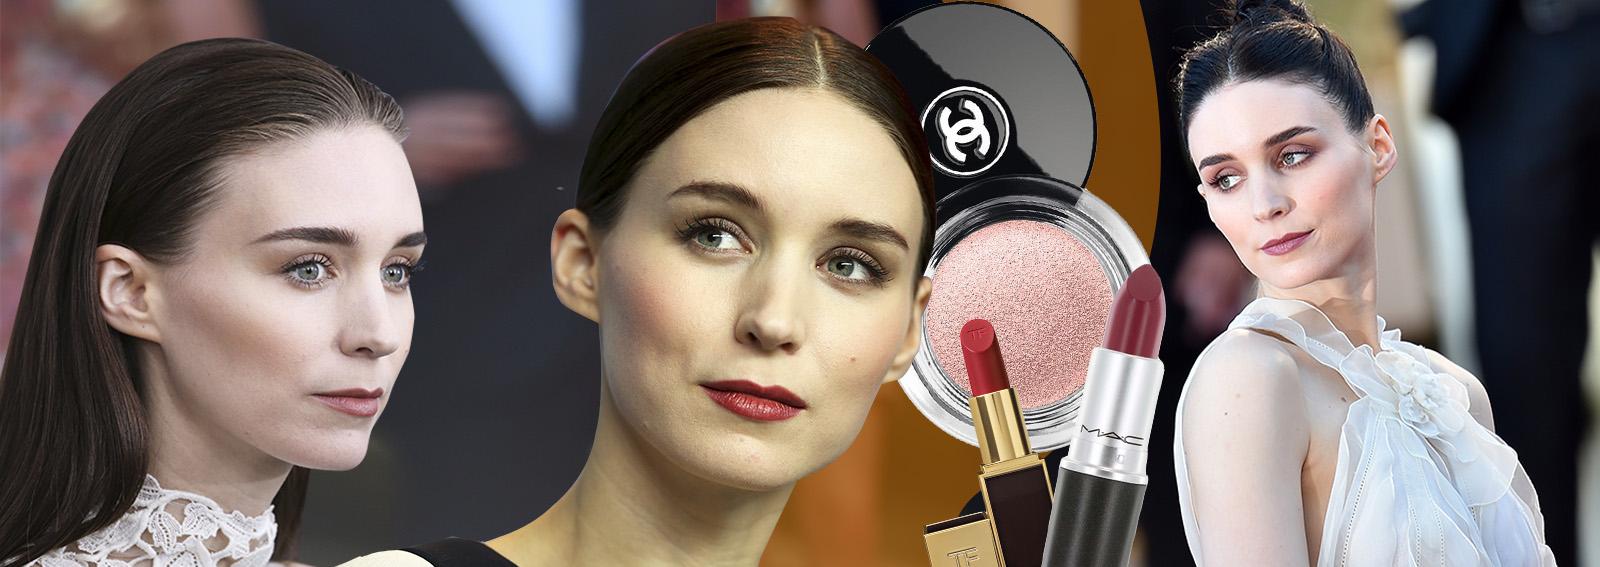 cover-rooney-mara-i-make-up-desktop